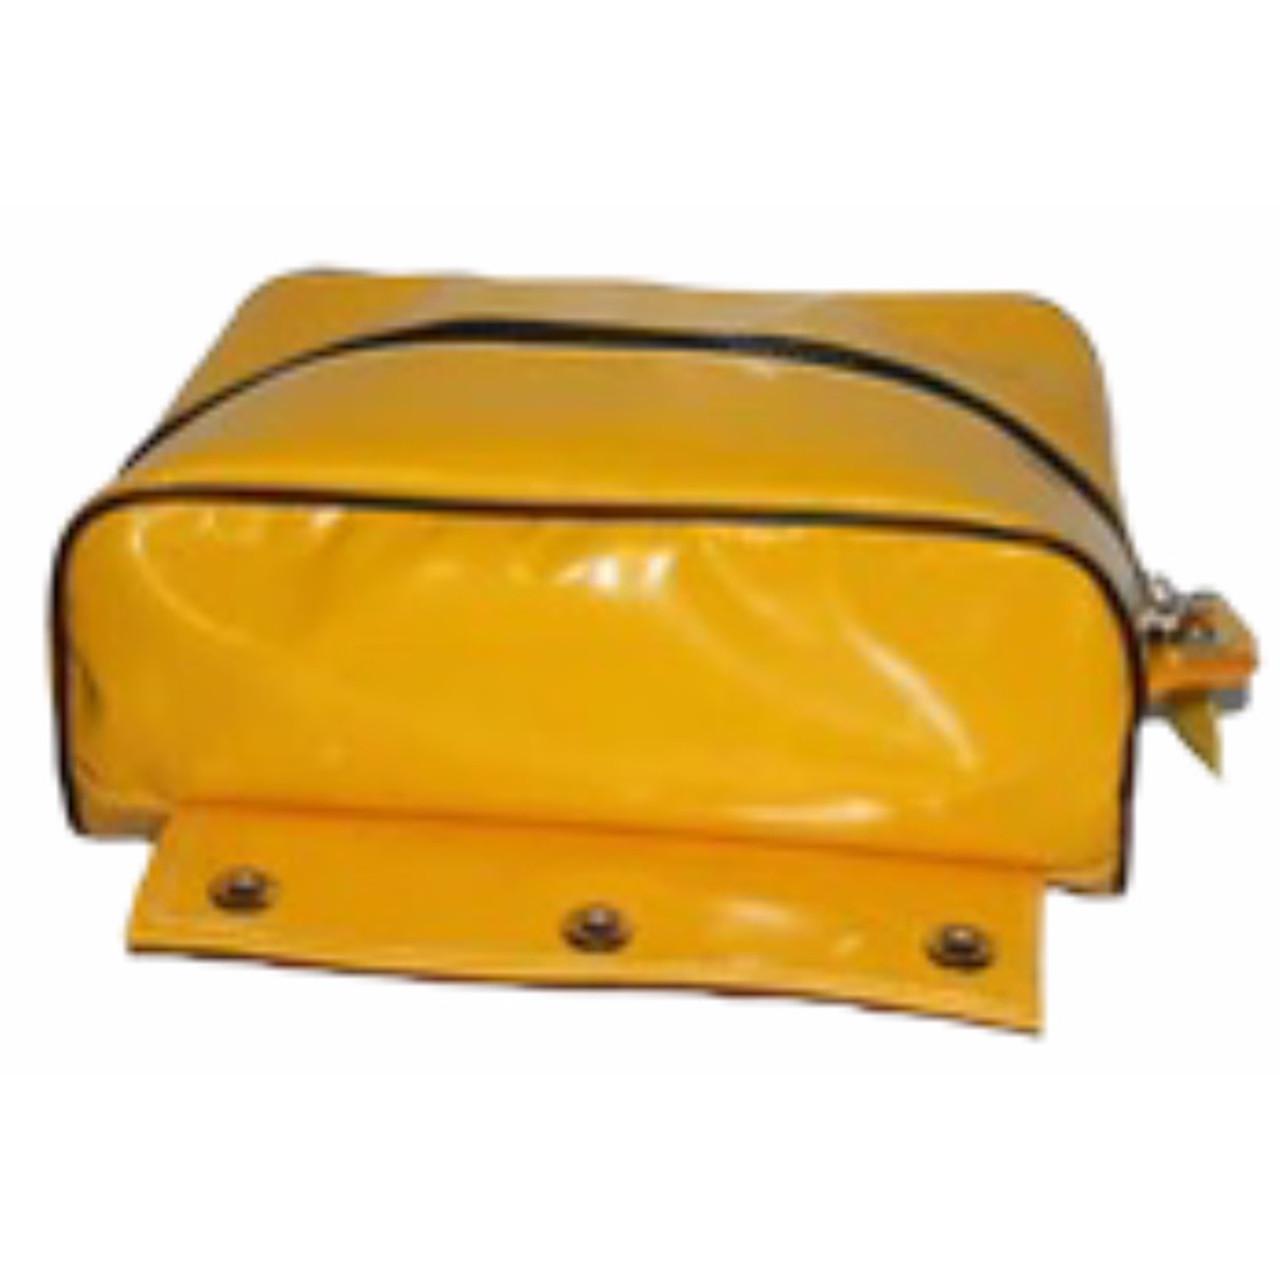 Bike Seat Bag Australian Made30cm L x  19cm W x 17cm H